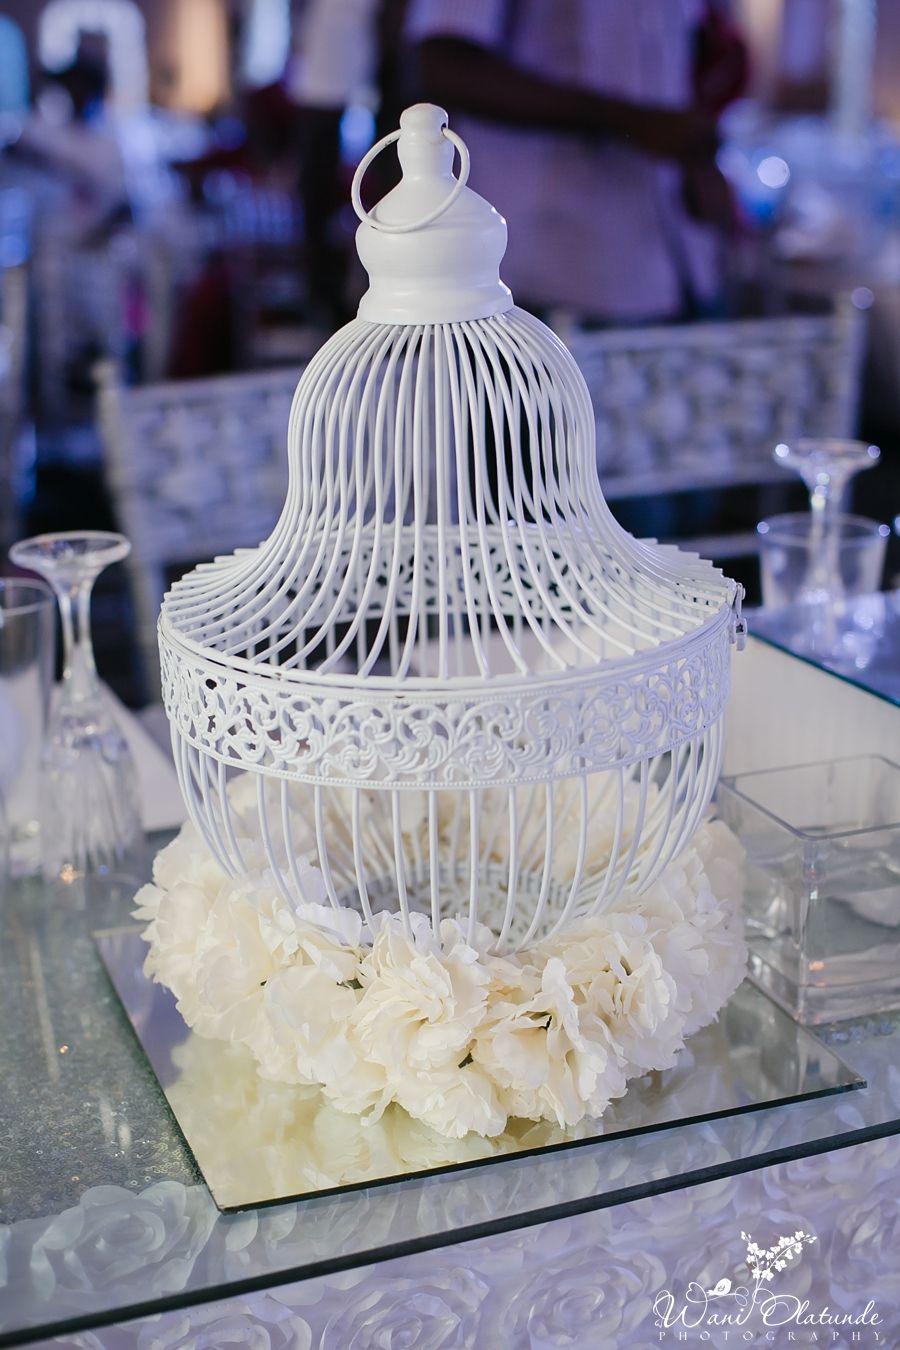 Yoruba traditional wedding decorations  Beautiful Traditional Yoruba Wedding  Wedding ideas  Pinterest